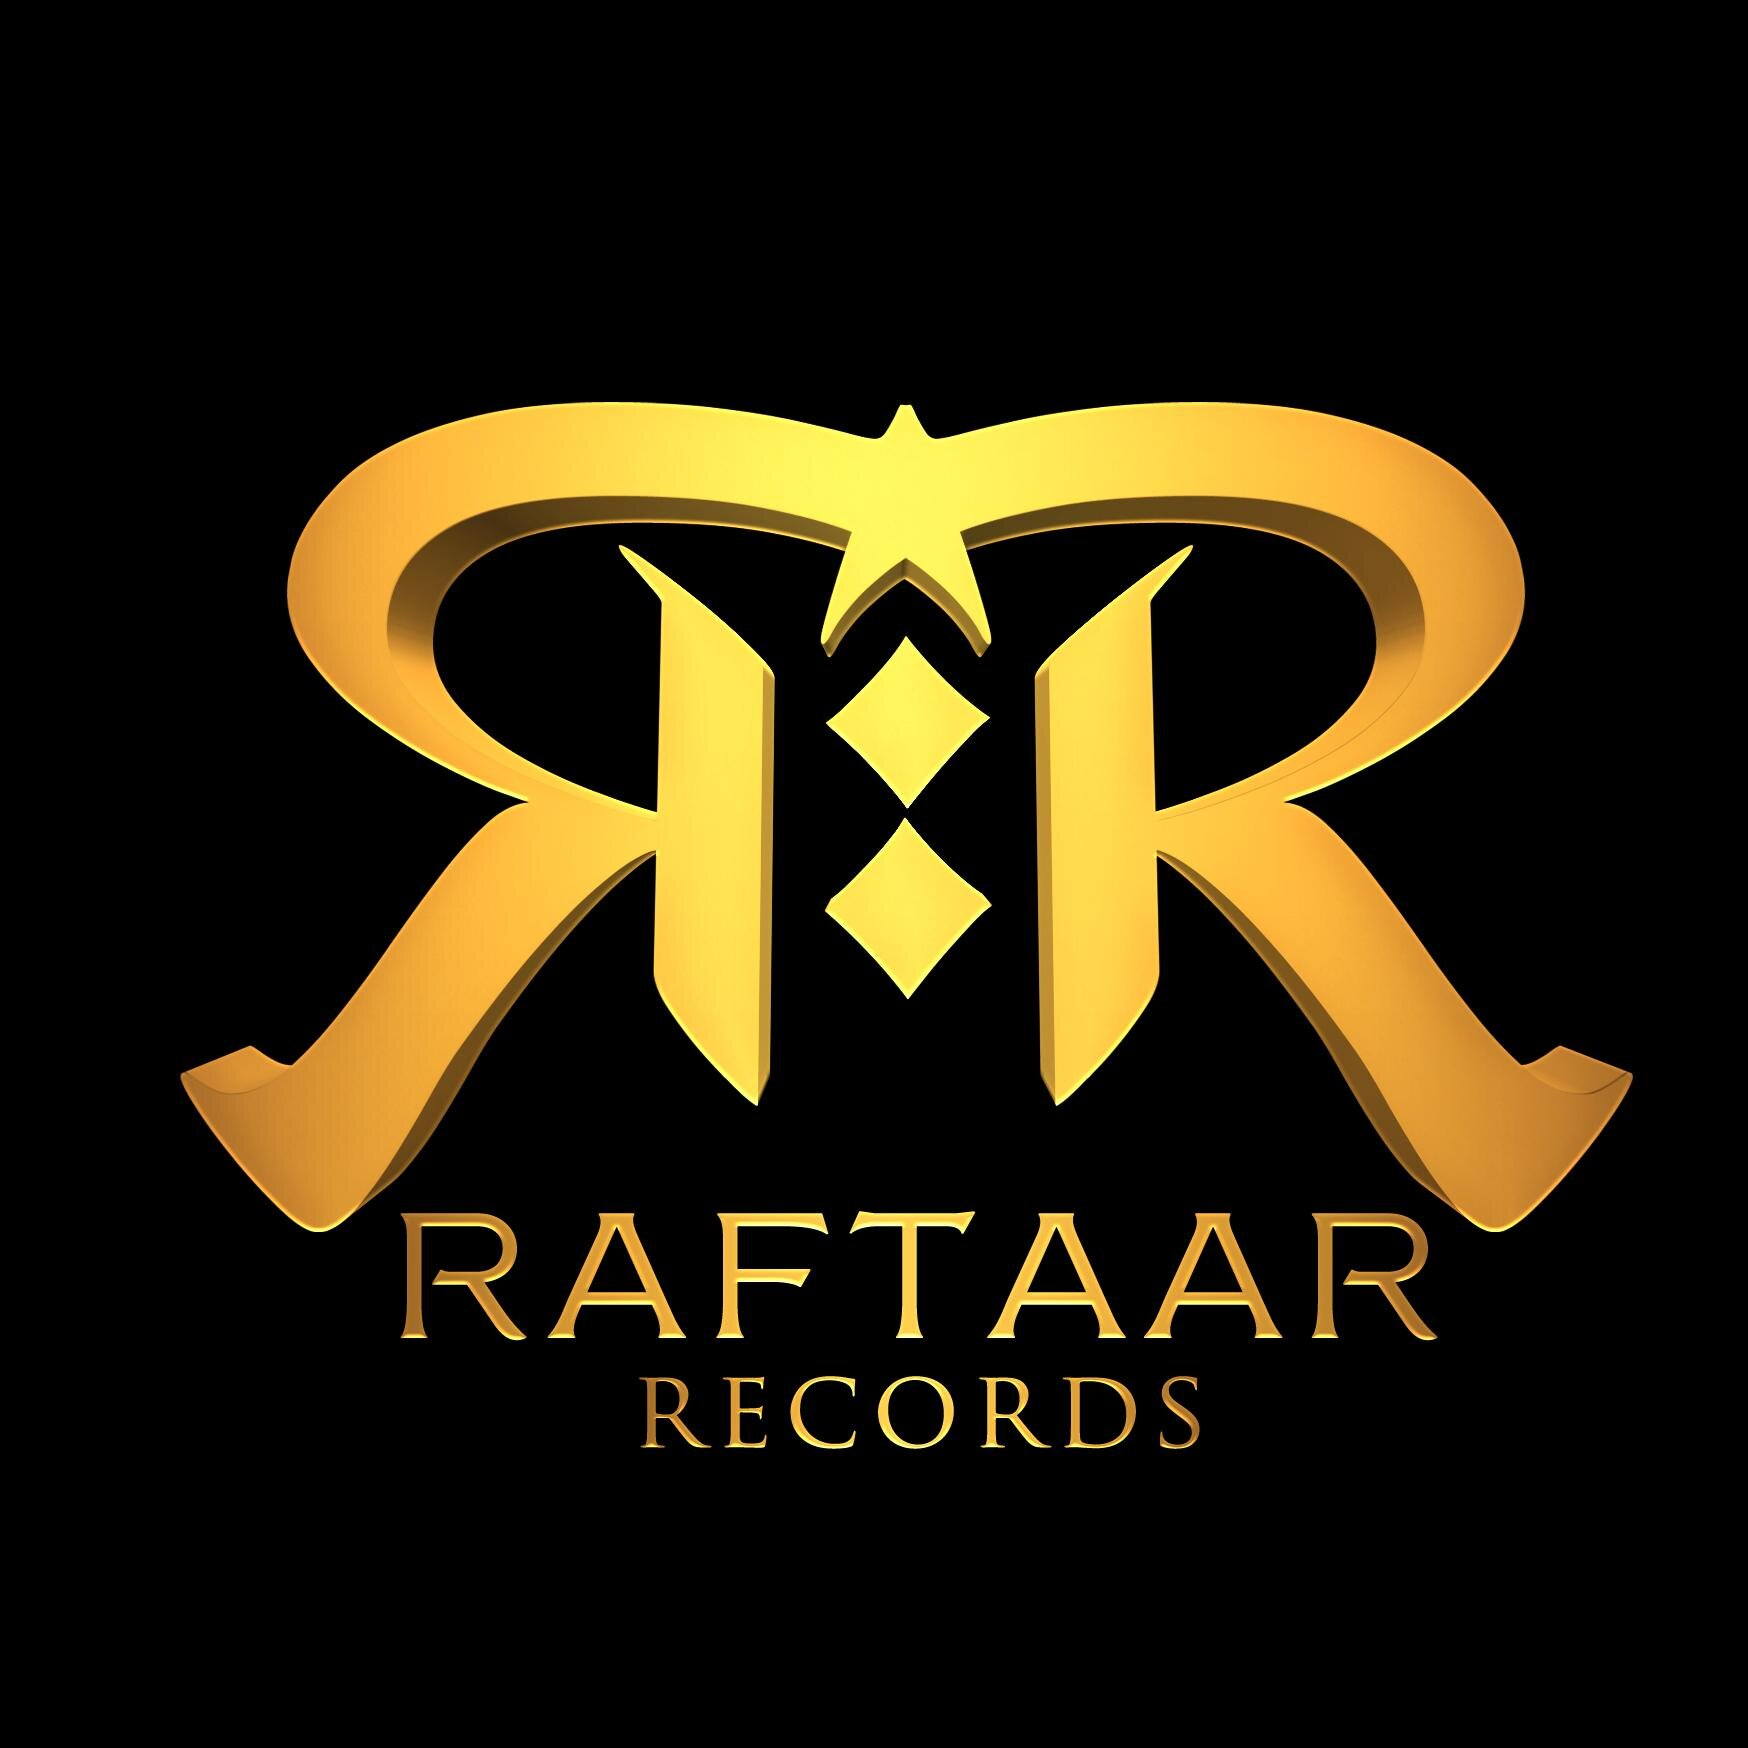 Raftaar Records on Twitter: